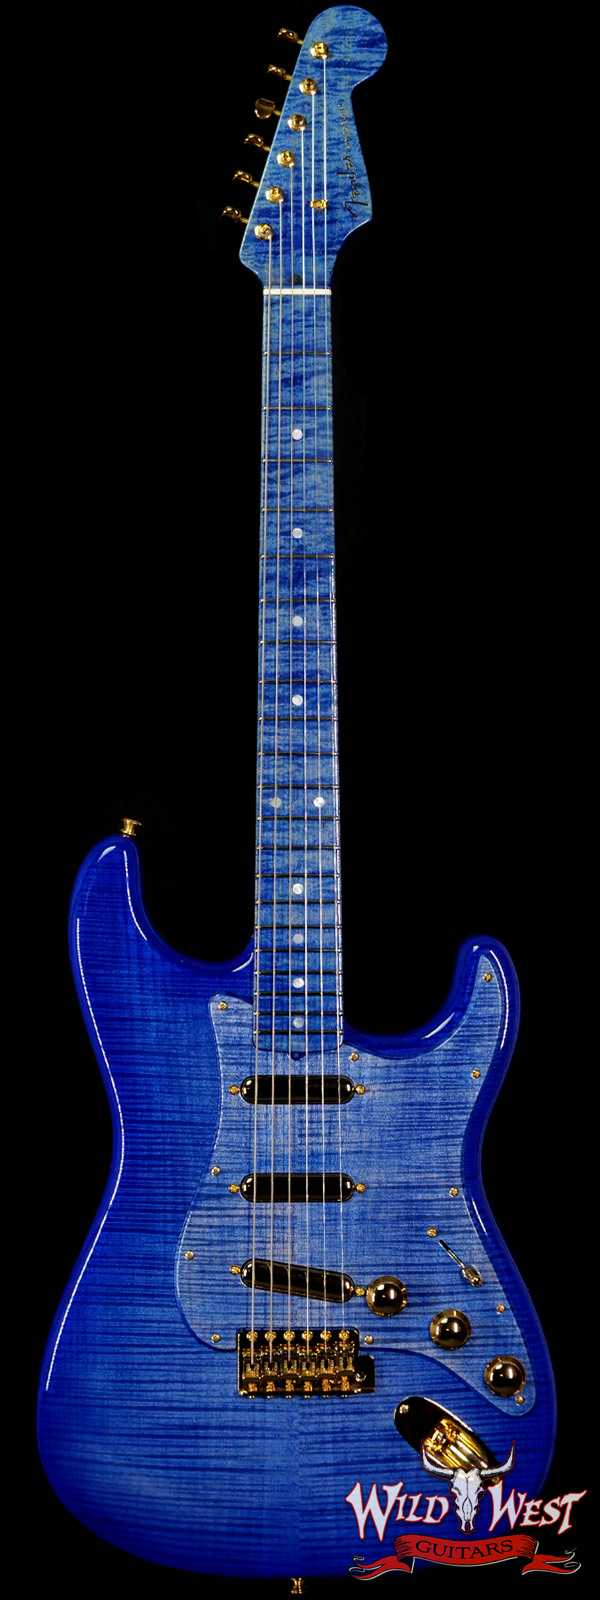 Fender Custom Shop Kyle McMillin Masterbuilt Flame Maple 60's Stratocaster NOS Royal Blue Hand-Wound Pickups